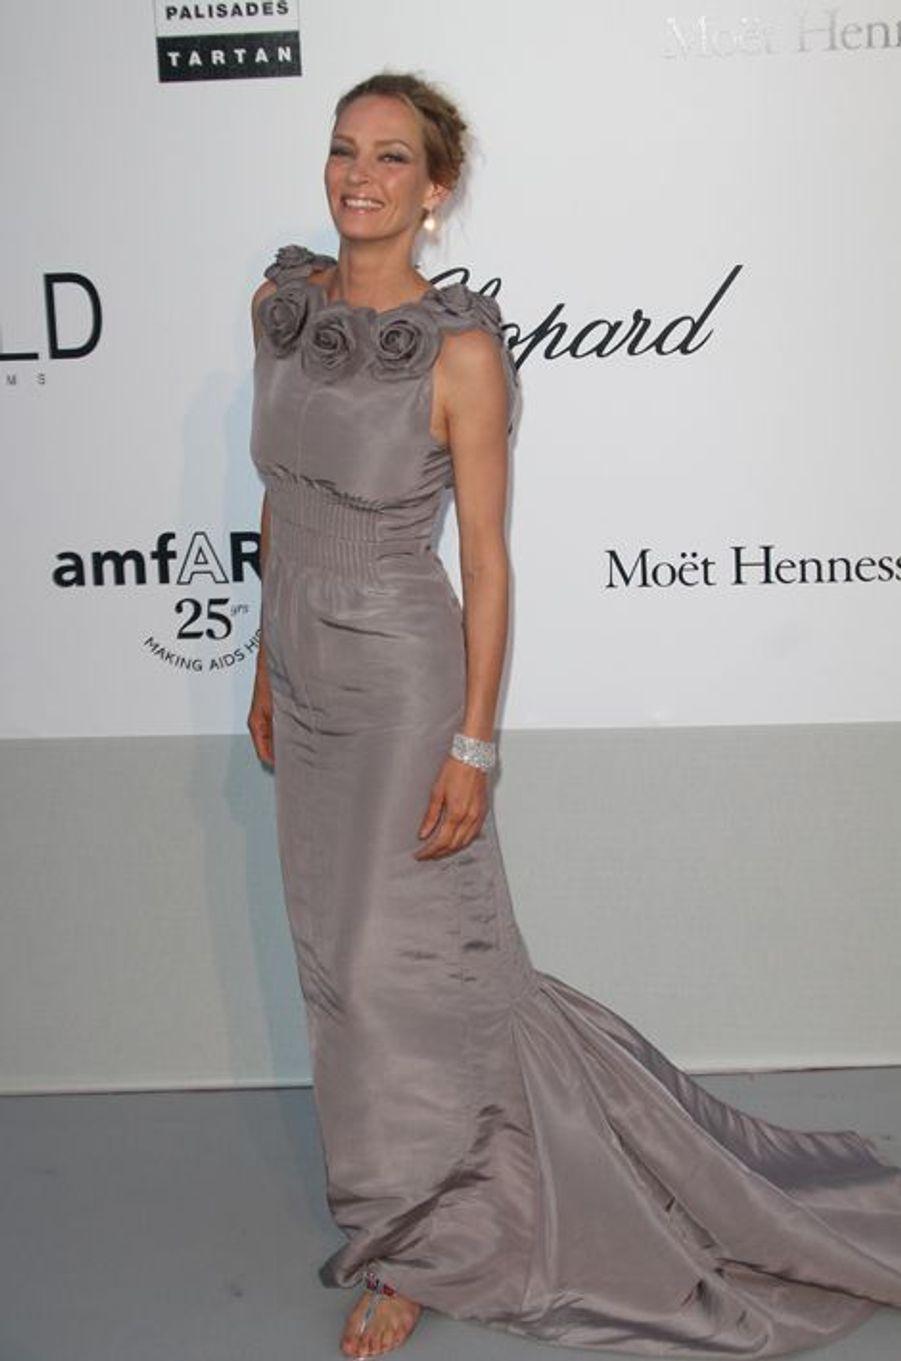 Uma Thurman en Chanel Couture au Gala de l'amfAR, en mai 2011